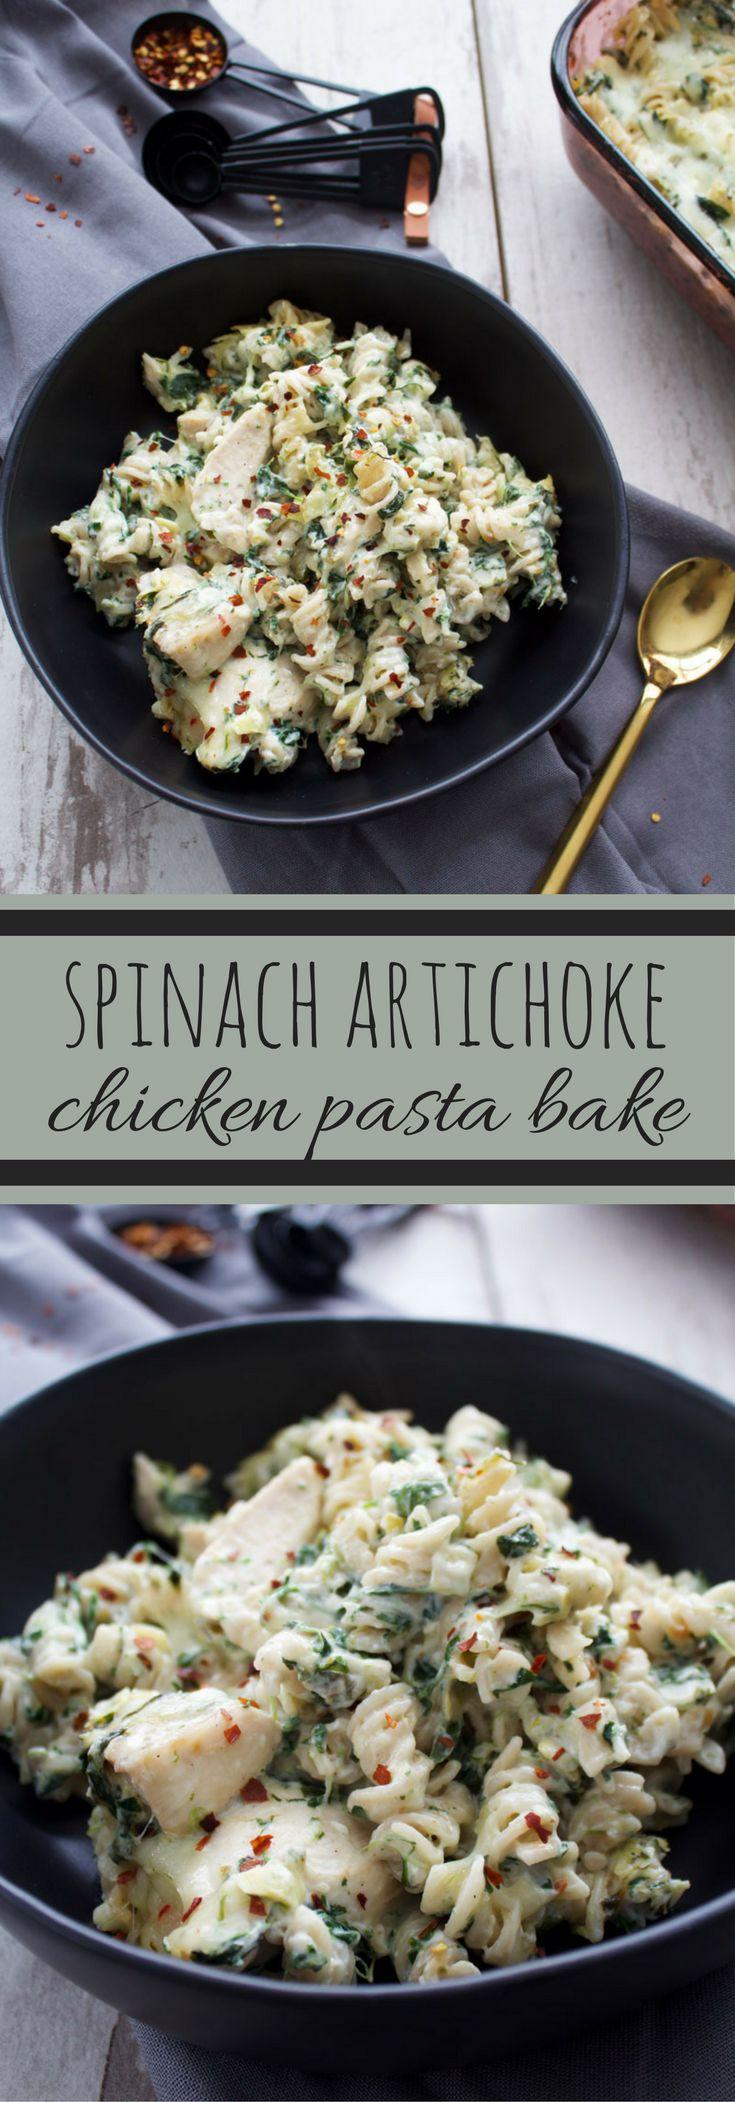 spinach artichoke chicken pasta bake | recipes | dinner | spinach artichoke dip | jalepenos | chicken | chicken pasta bake | pasta | pepperjack | lightened up